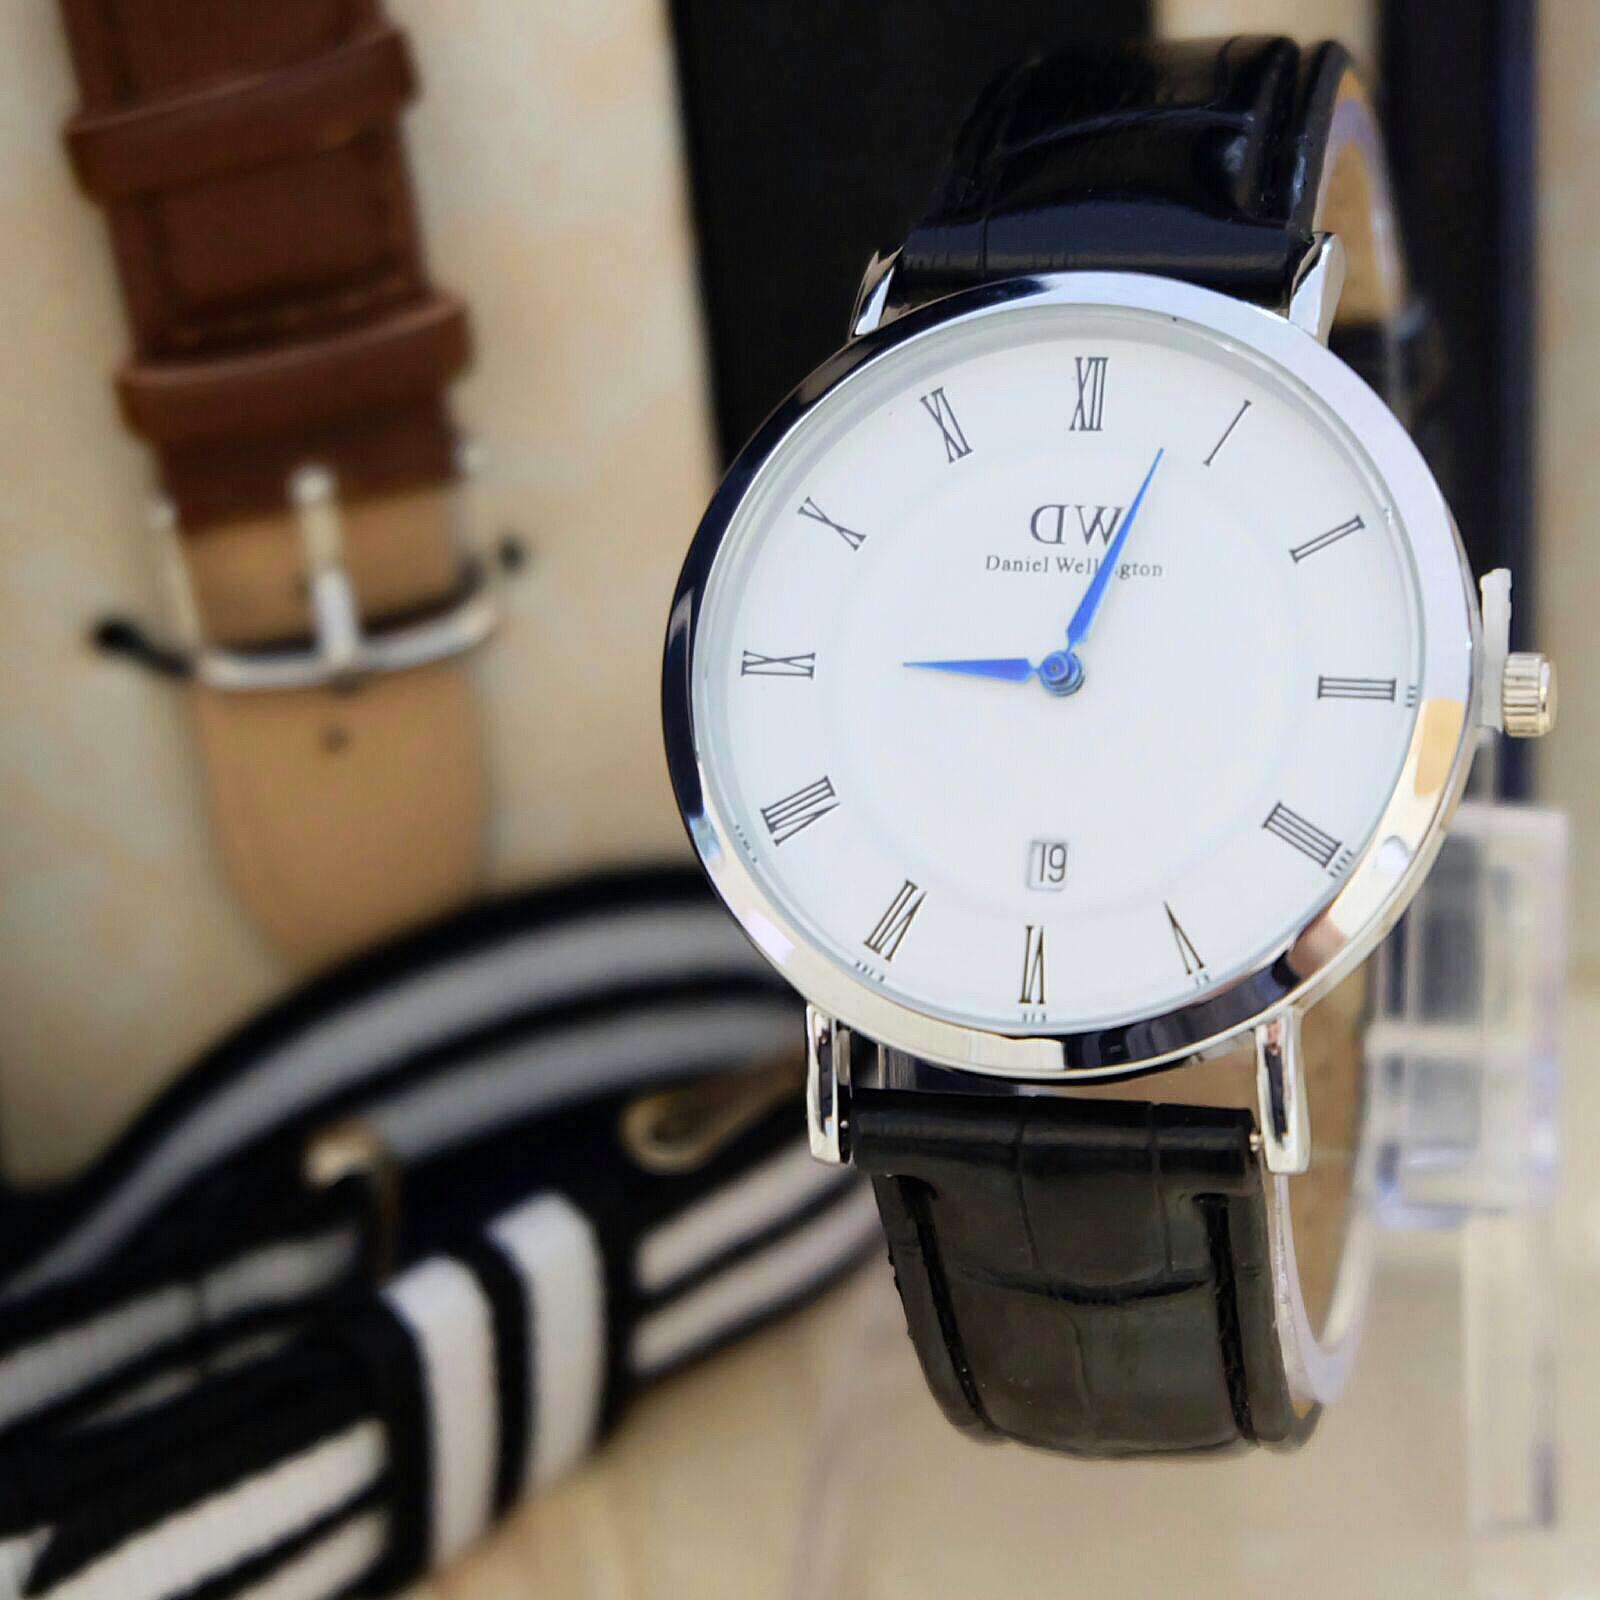 jam tangan dw daniel wellington paket canvas kulit romawi